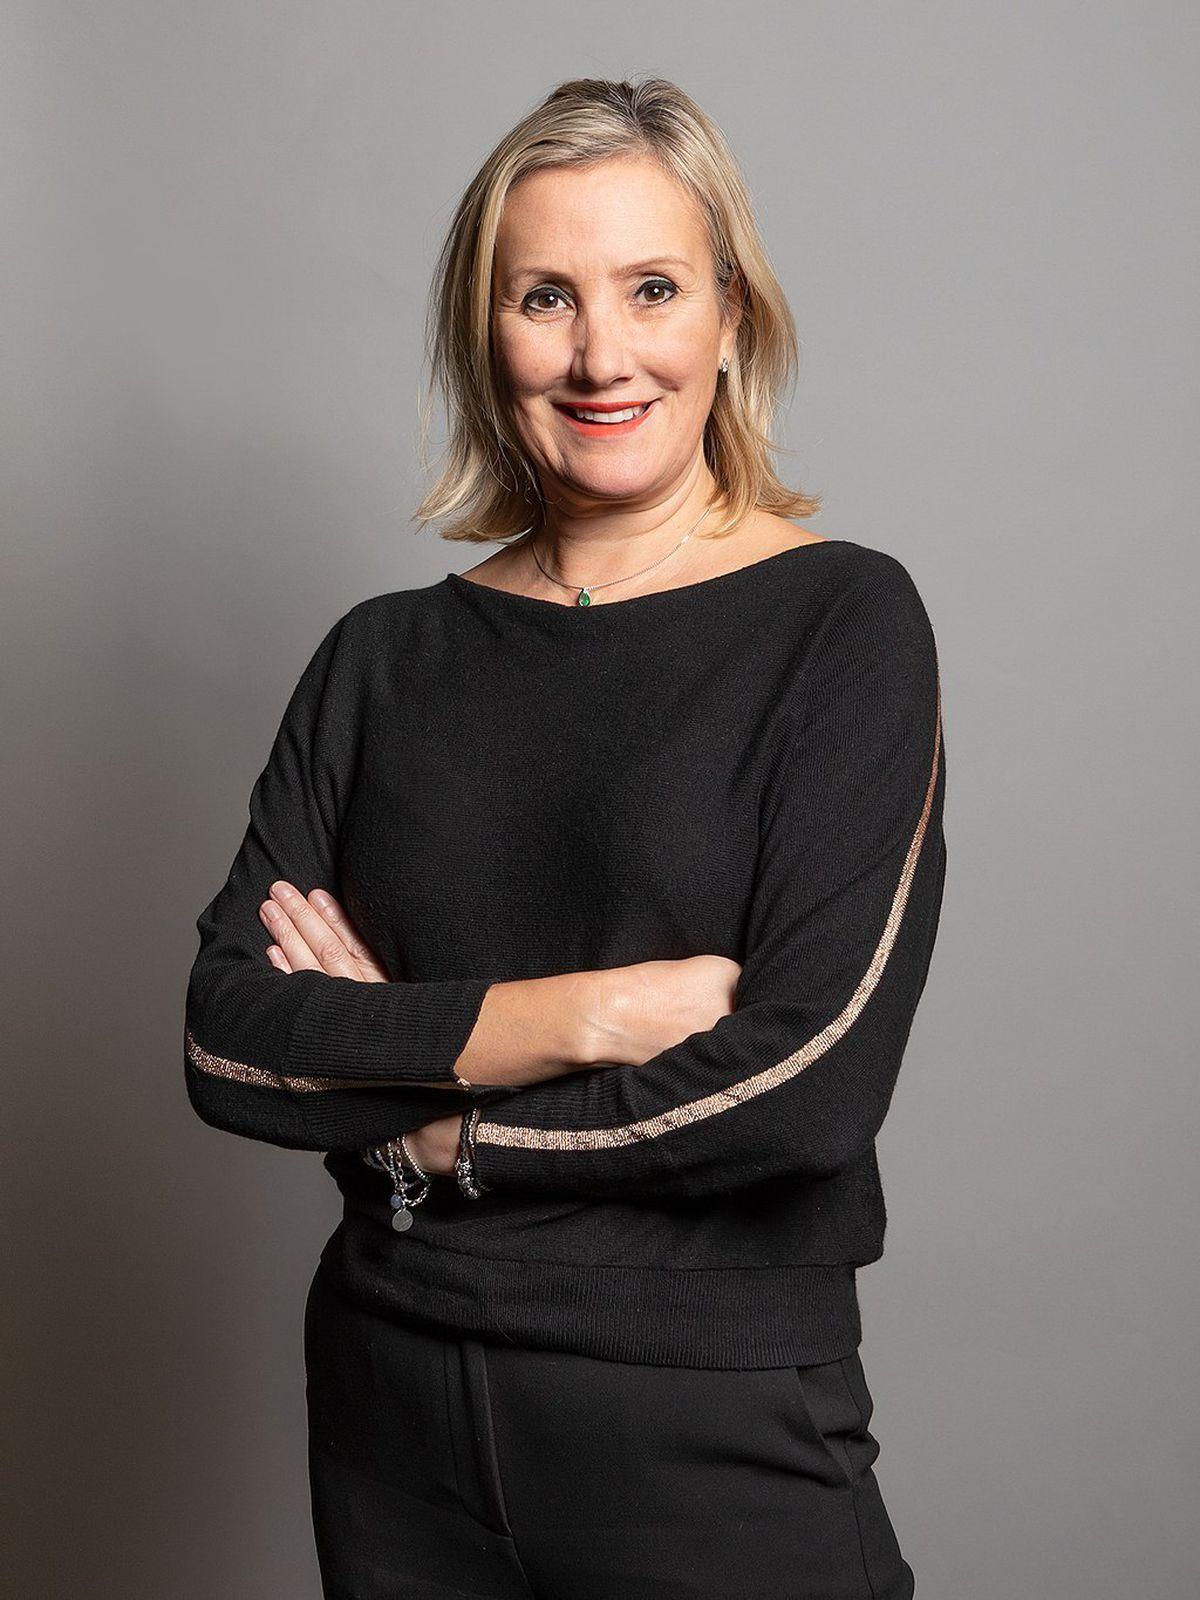 Minister for Digital and Culture Caroline Dinenage MP